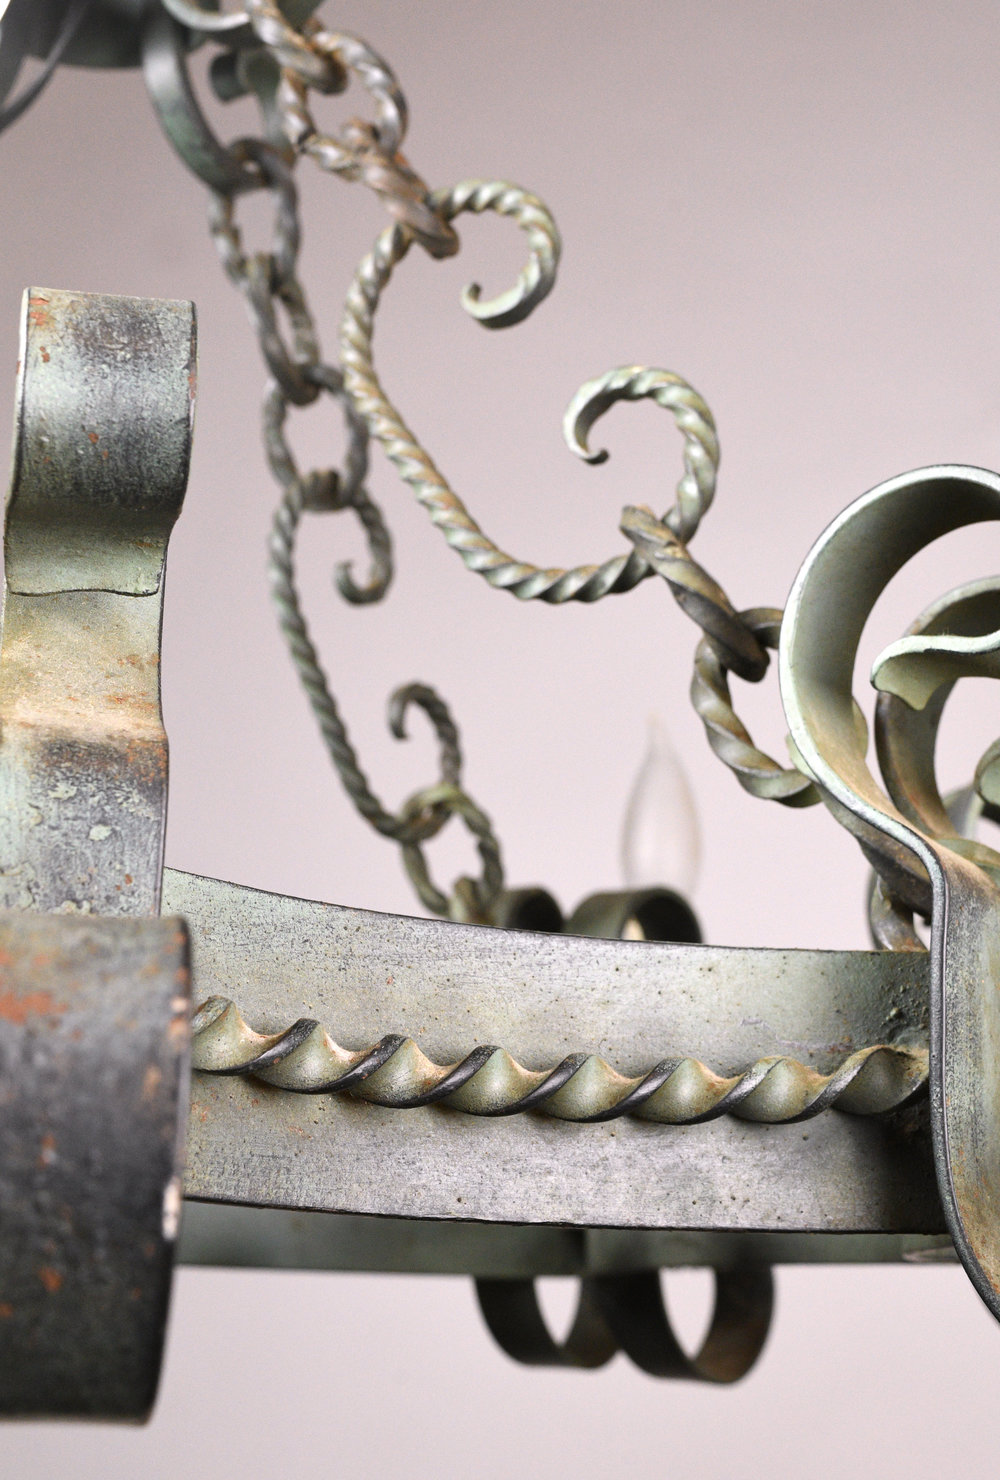 47870-italianate-chandelier-ring-detail.jpg